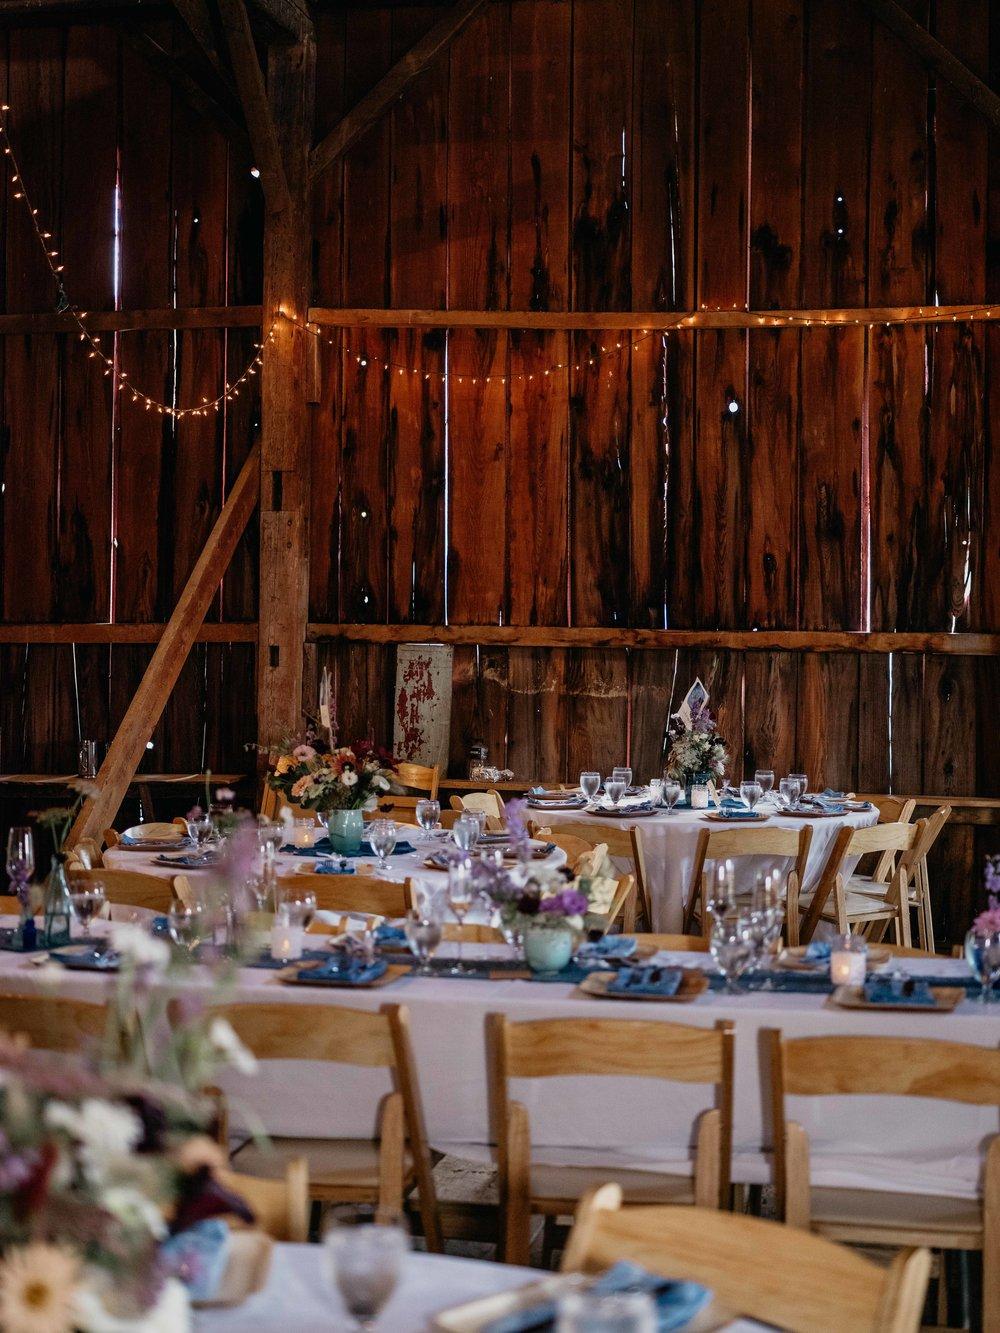 Wiilde-Scout-Photo-Co-Lauren-Steve-Bliss-Ridge-Wedding-Moretown-Vermont-196.jpg